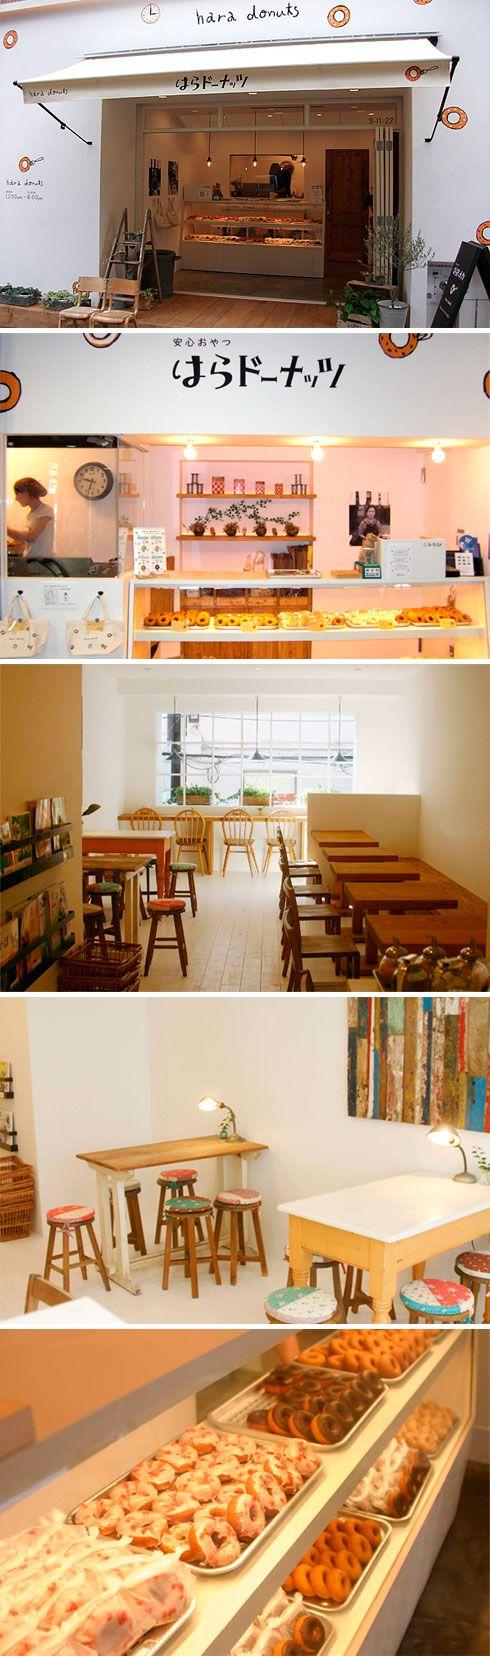 Hara Donuts Myeongdong Seoul Design Inspiration Storefront